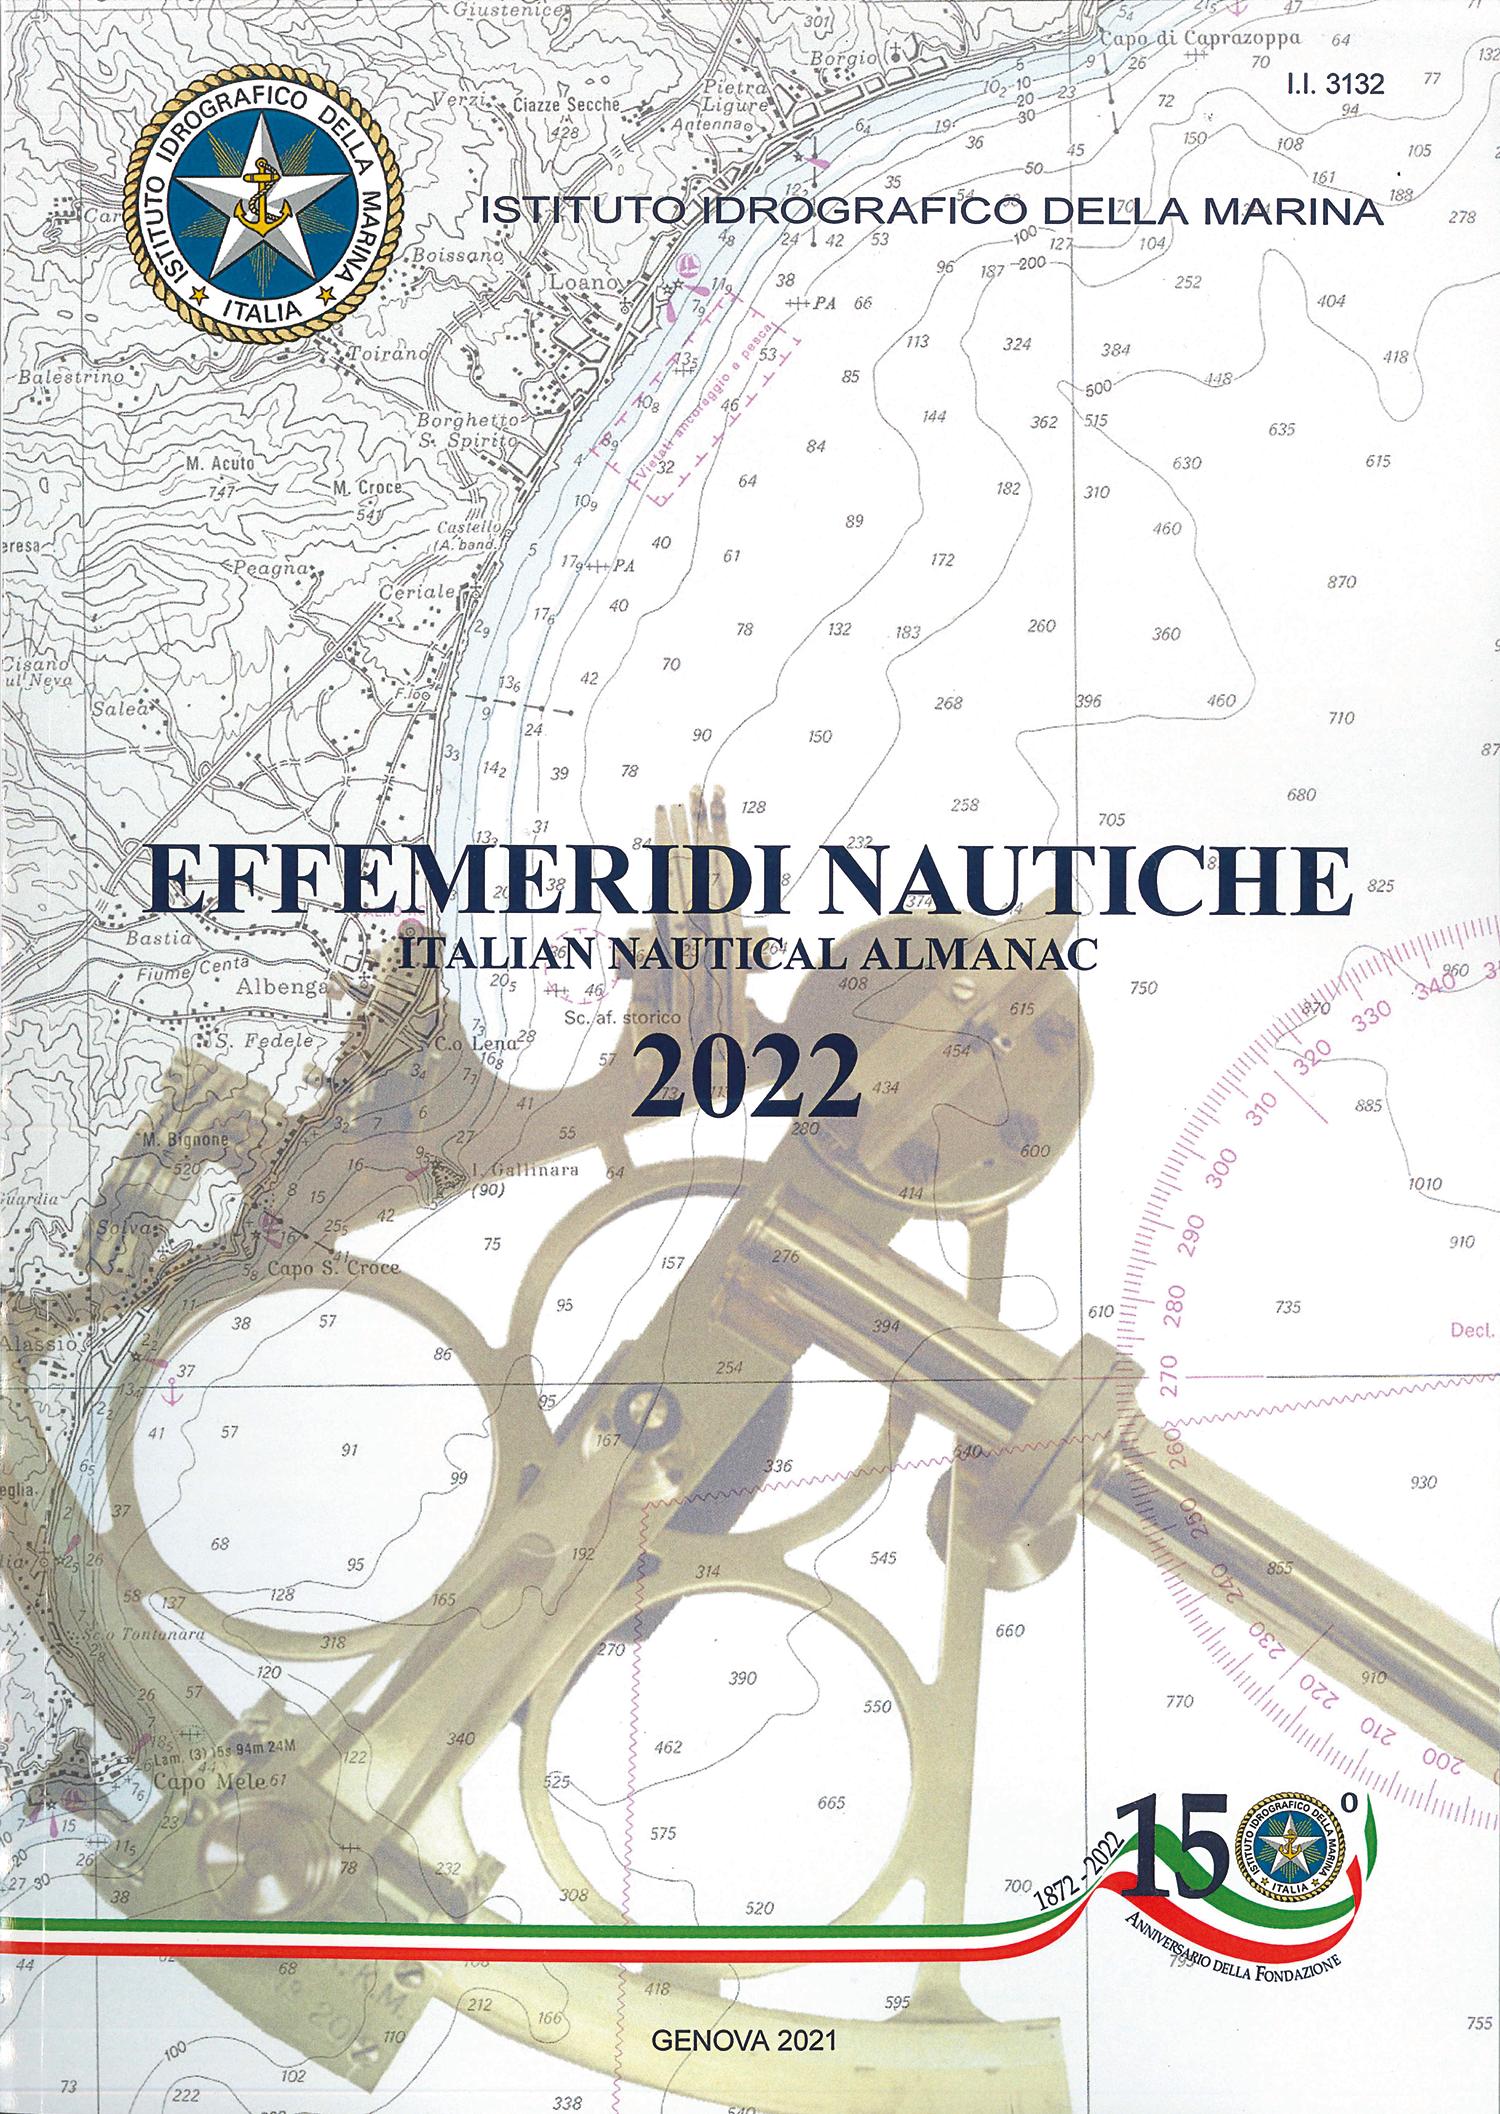 Effemeridi Nautiche 2022